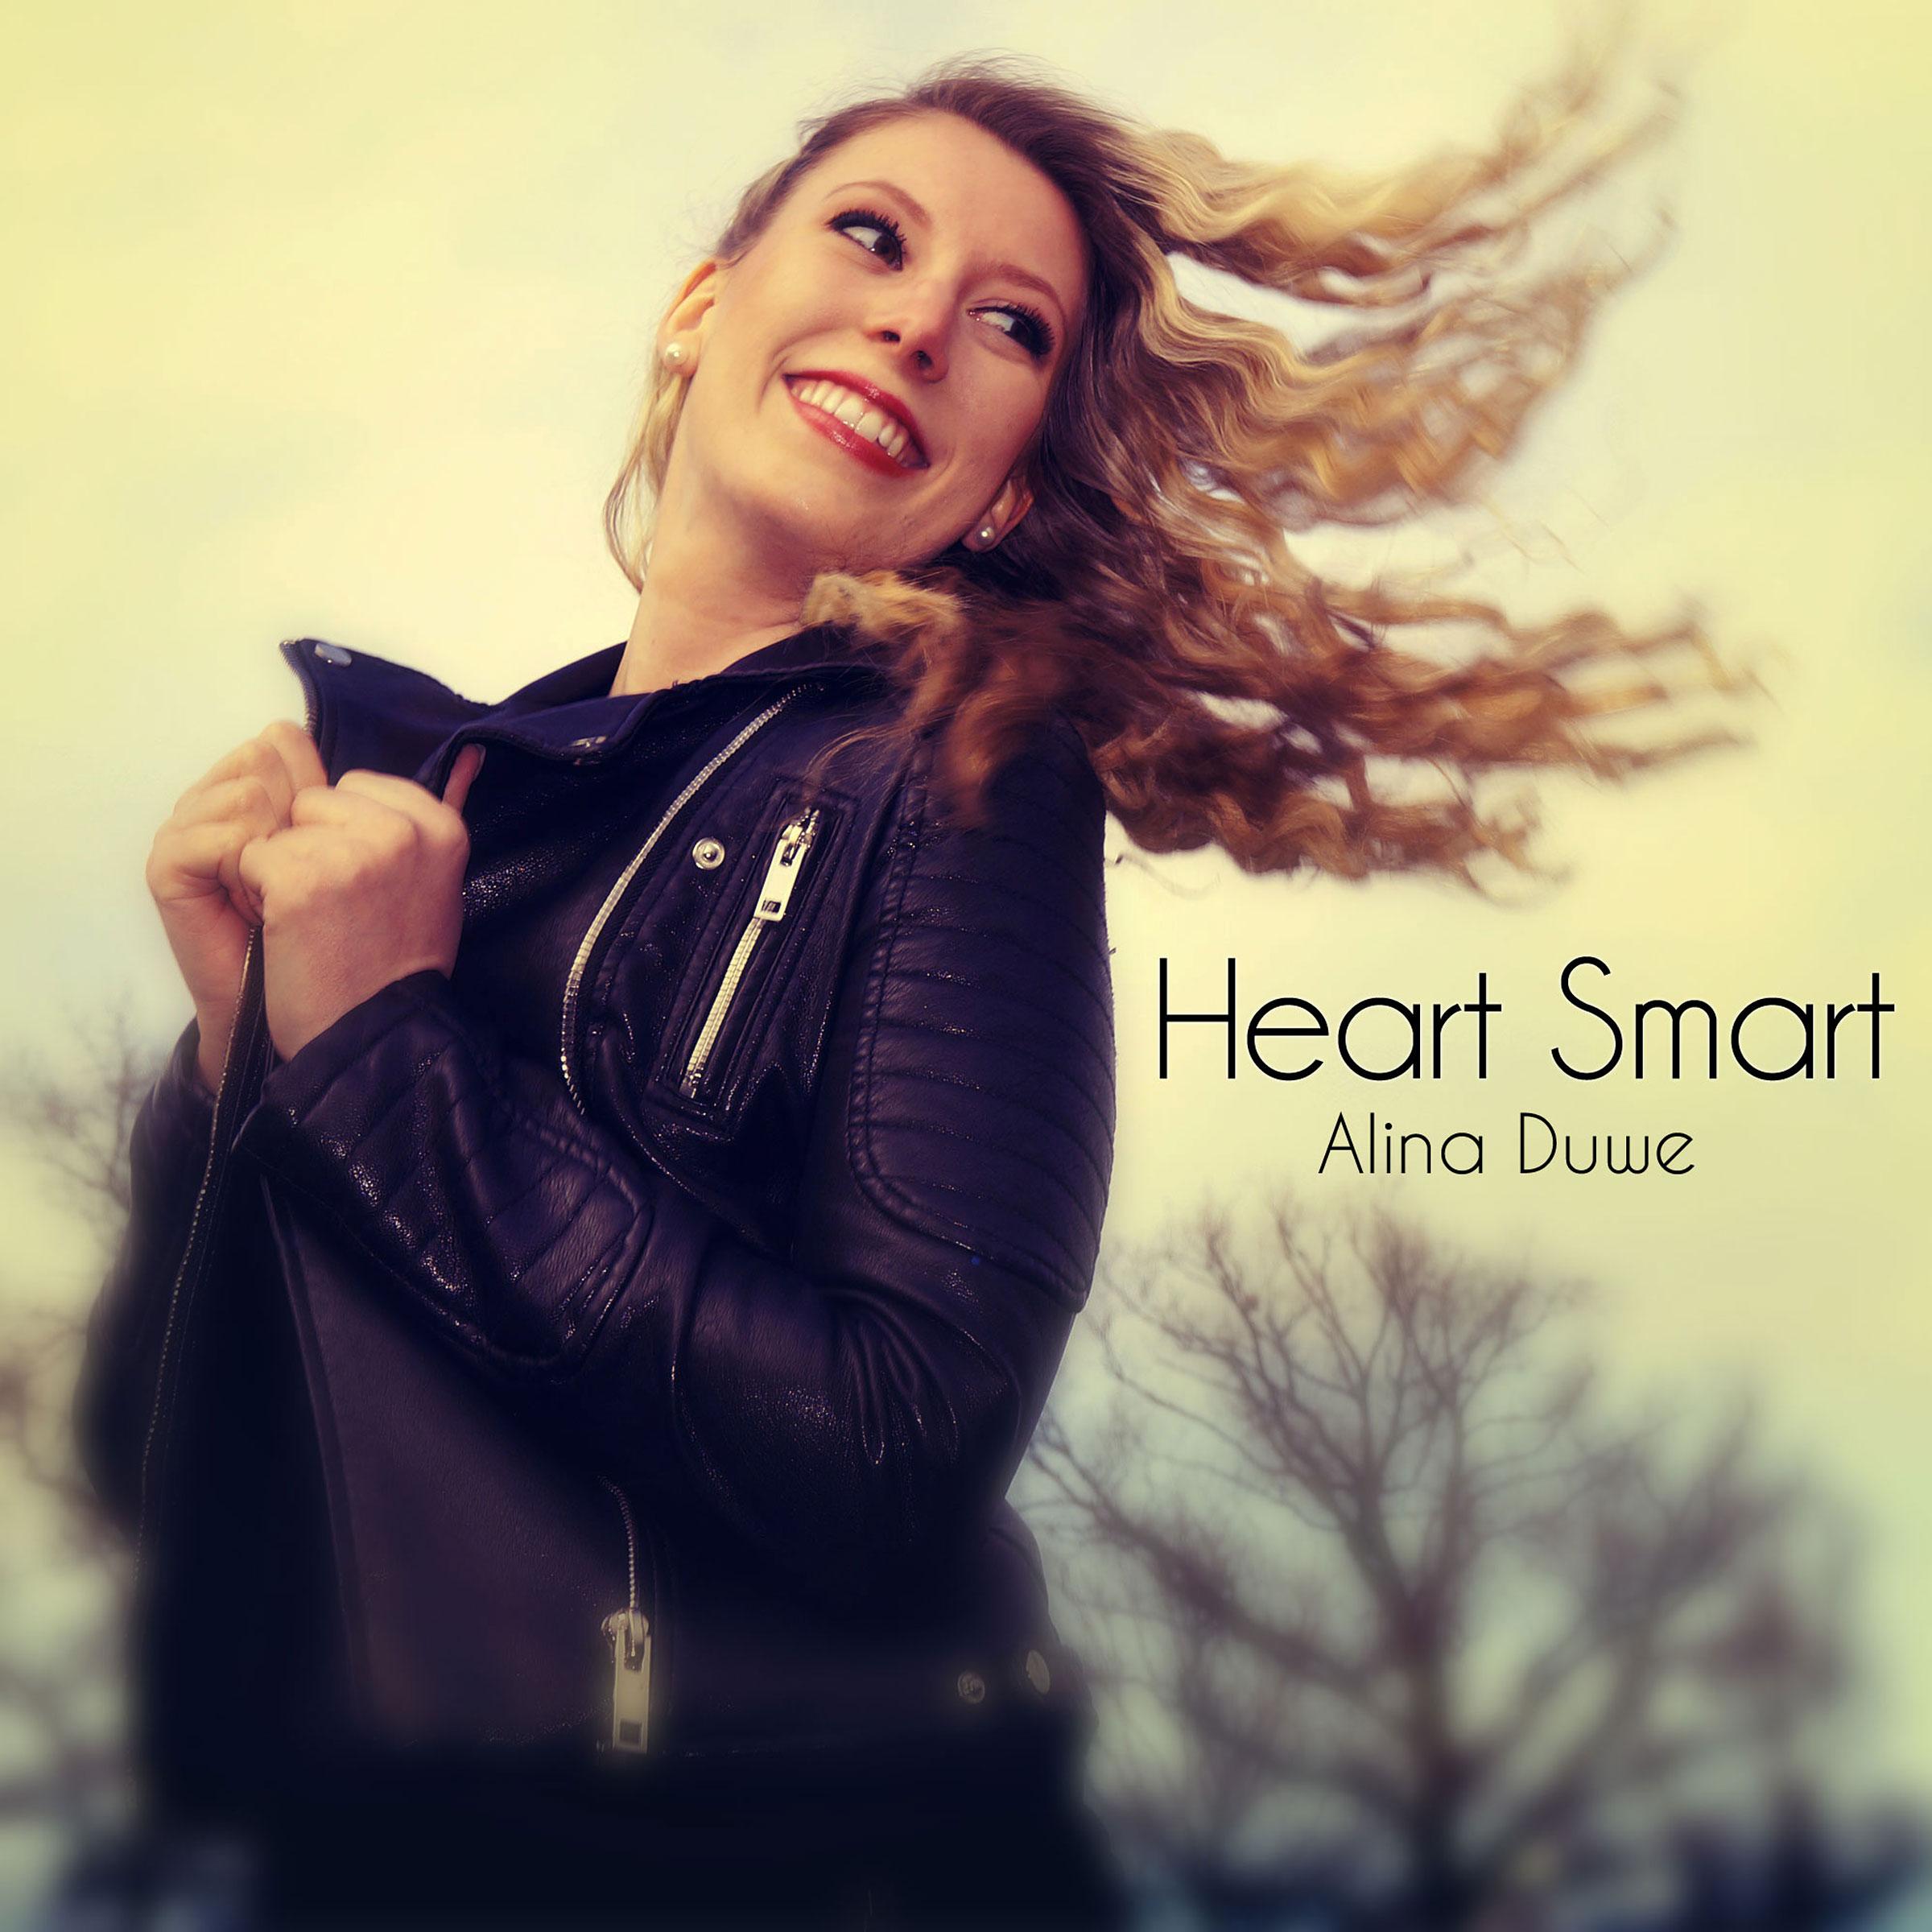 Alina Duwe - Heart Smart